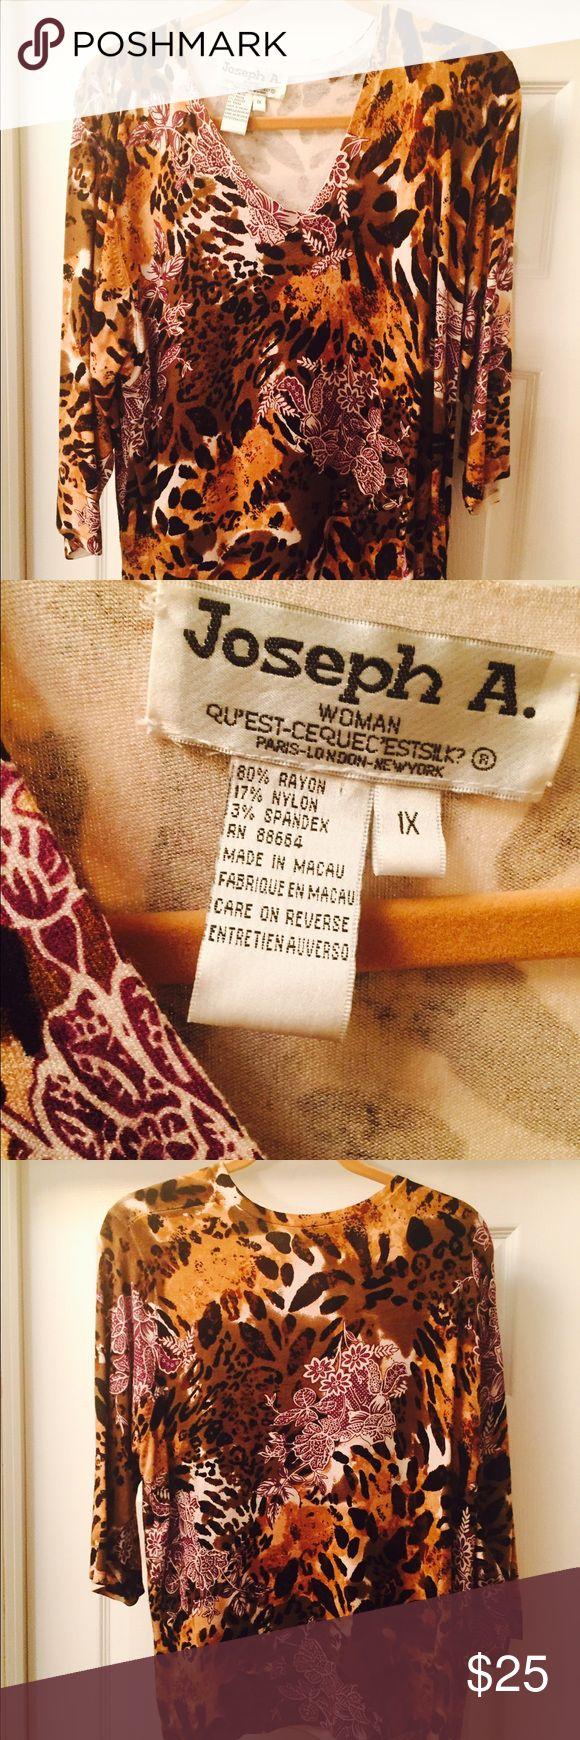 Pretty colorful women's animal print v-neck shirt REDUCED!!  Pretty and colorful animal print v-neck long sleeve shirt. Size 1x, rayon/nylon/spandex Joseph A Tops Tees - Long Sleeve